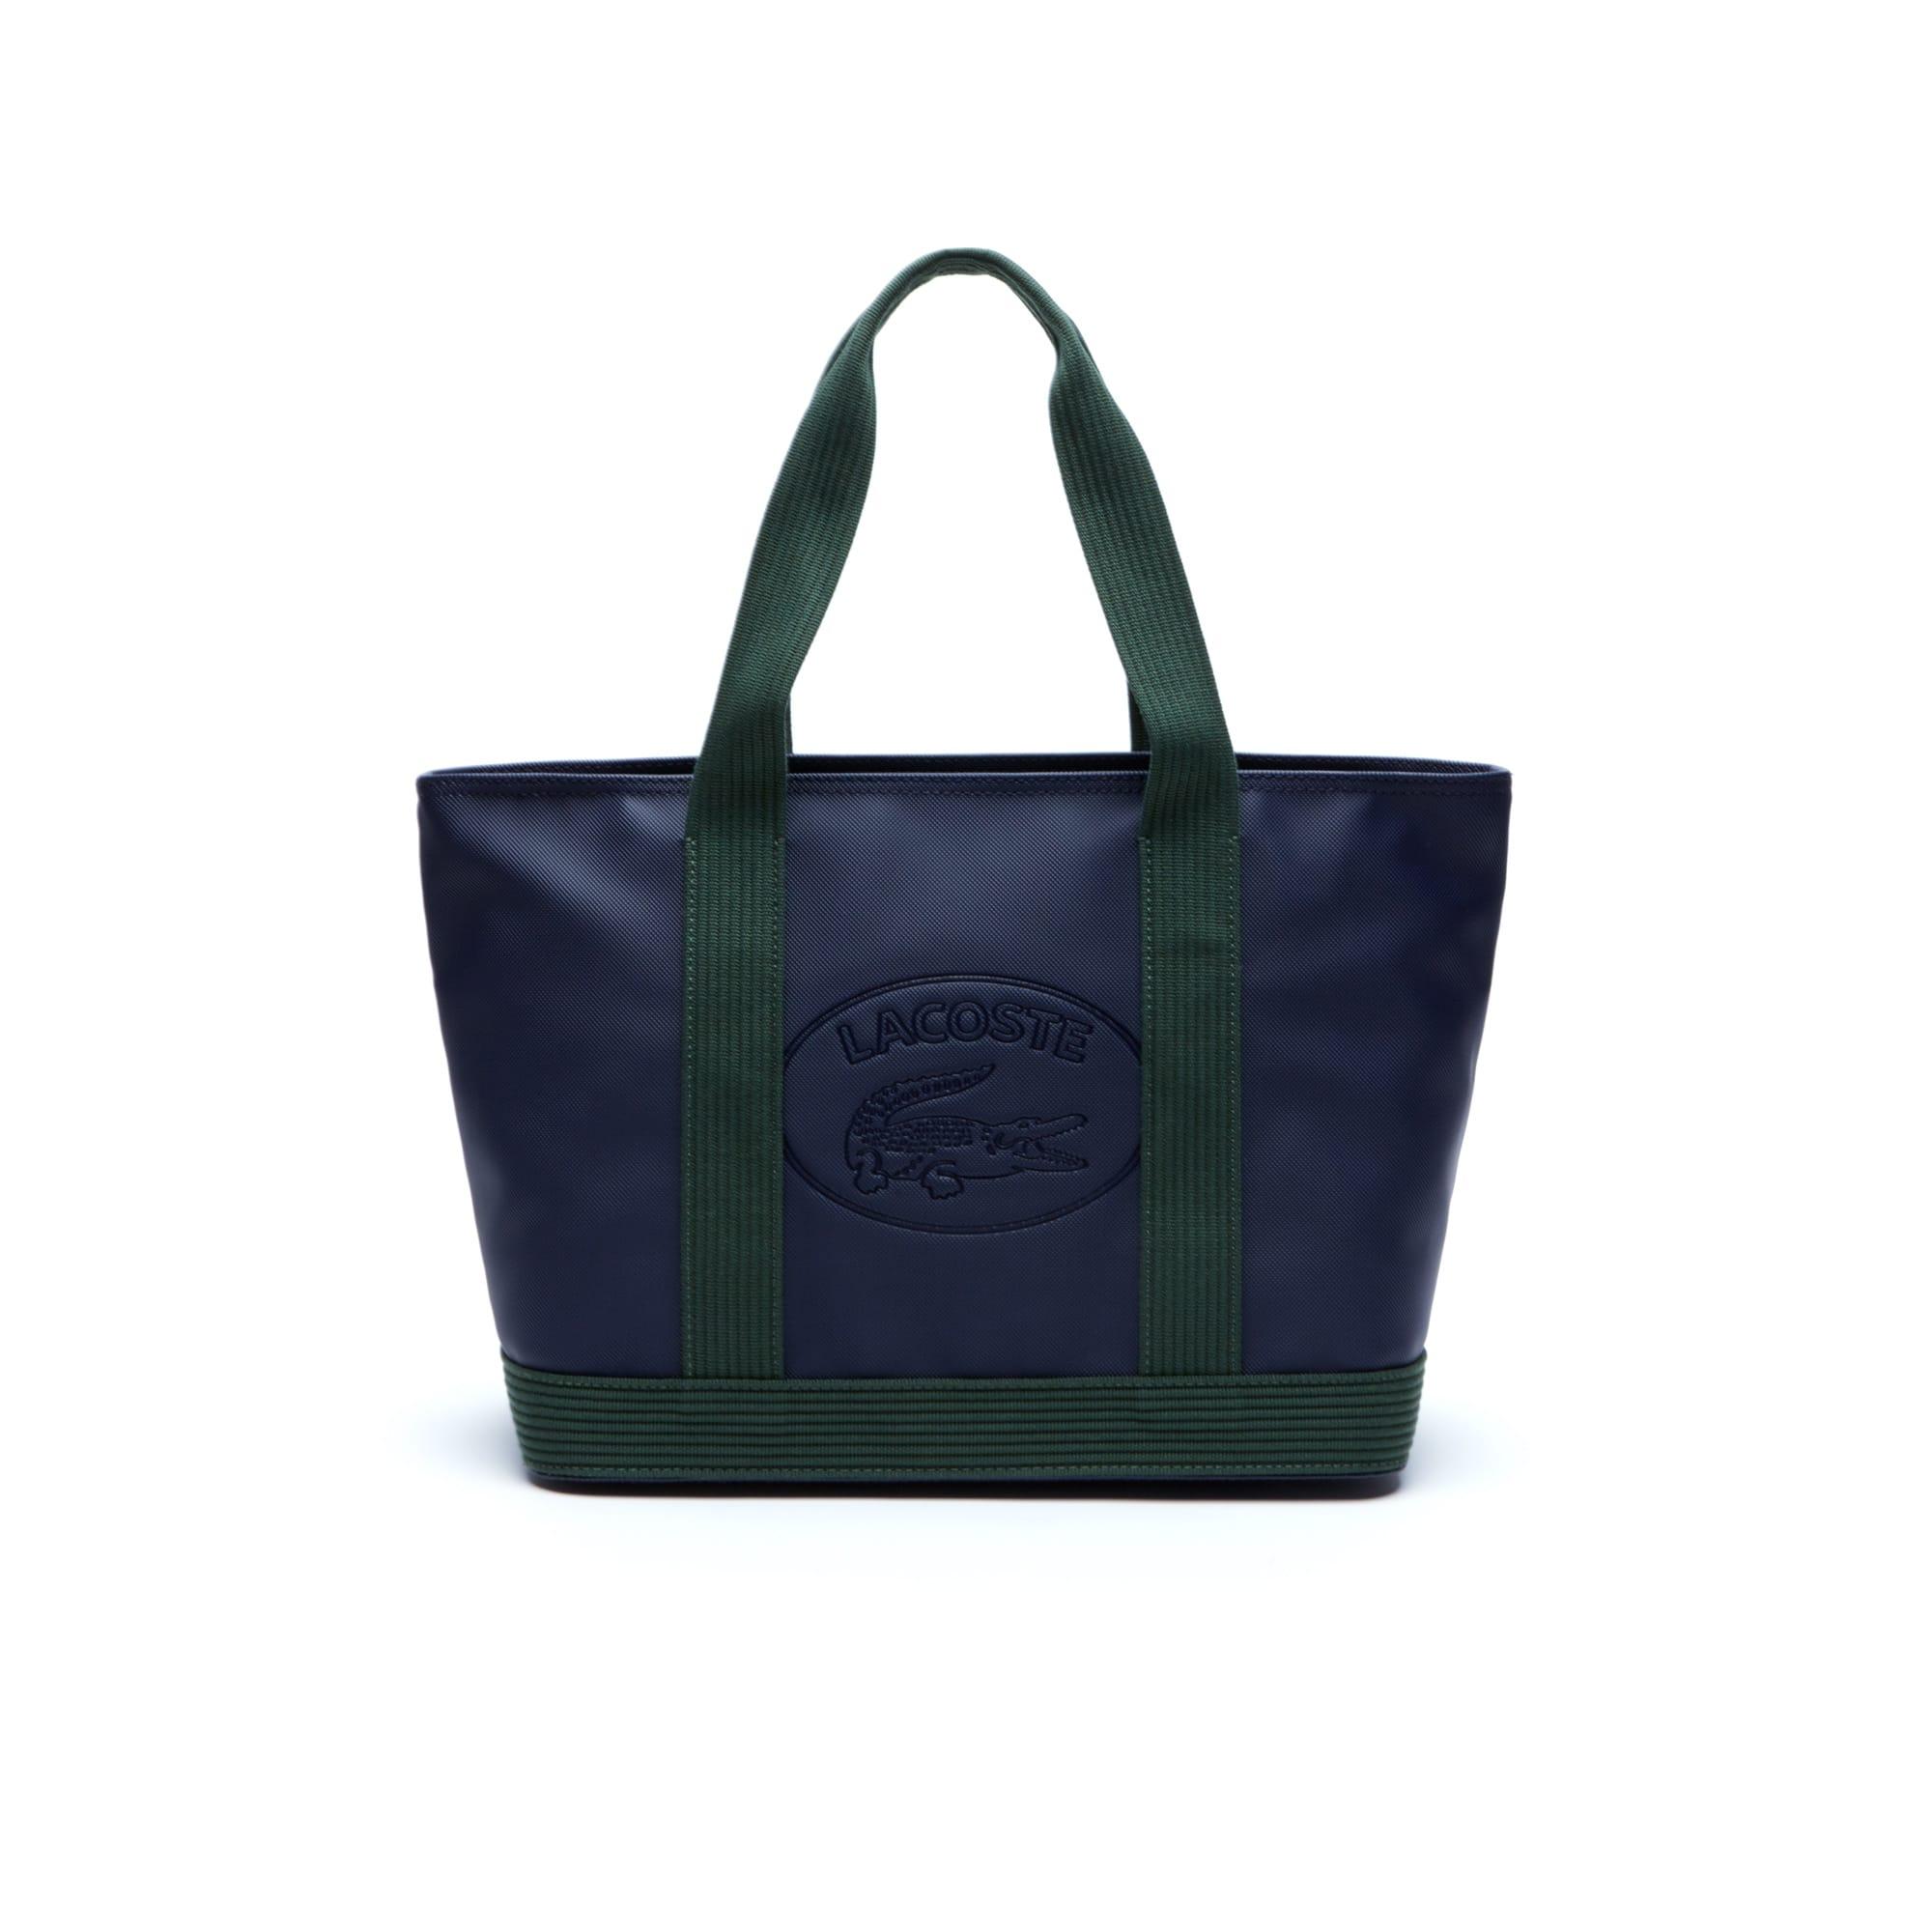 2cdd1654e5 Sacs à main cuir, sacs cabas | Maroquinerie femme | LACOSTE